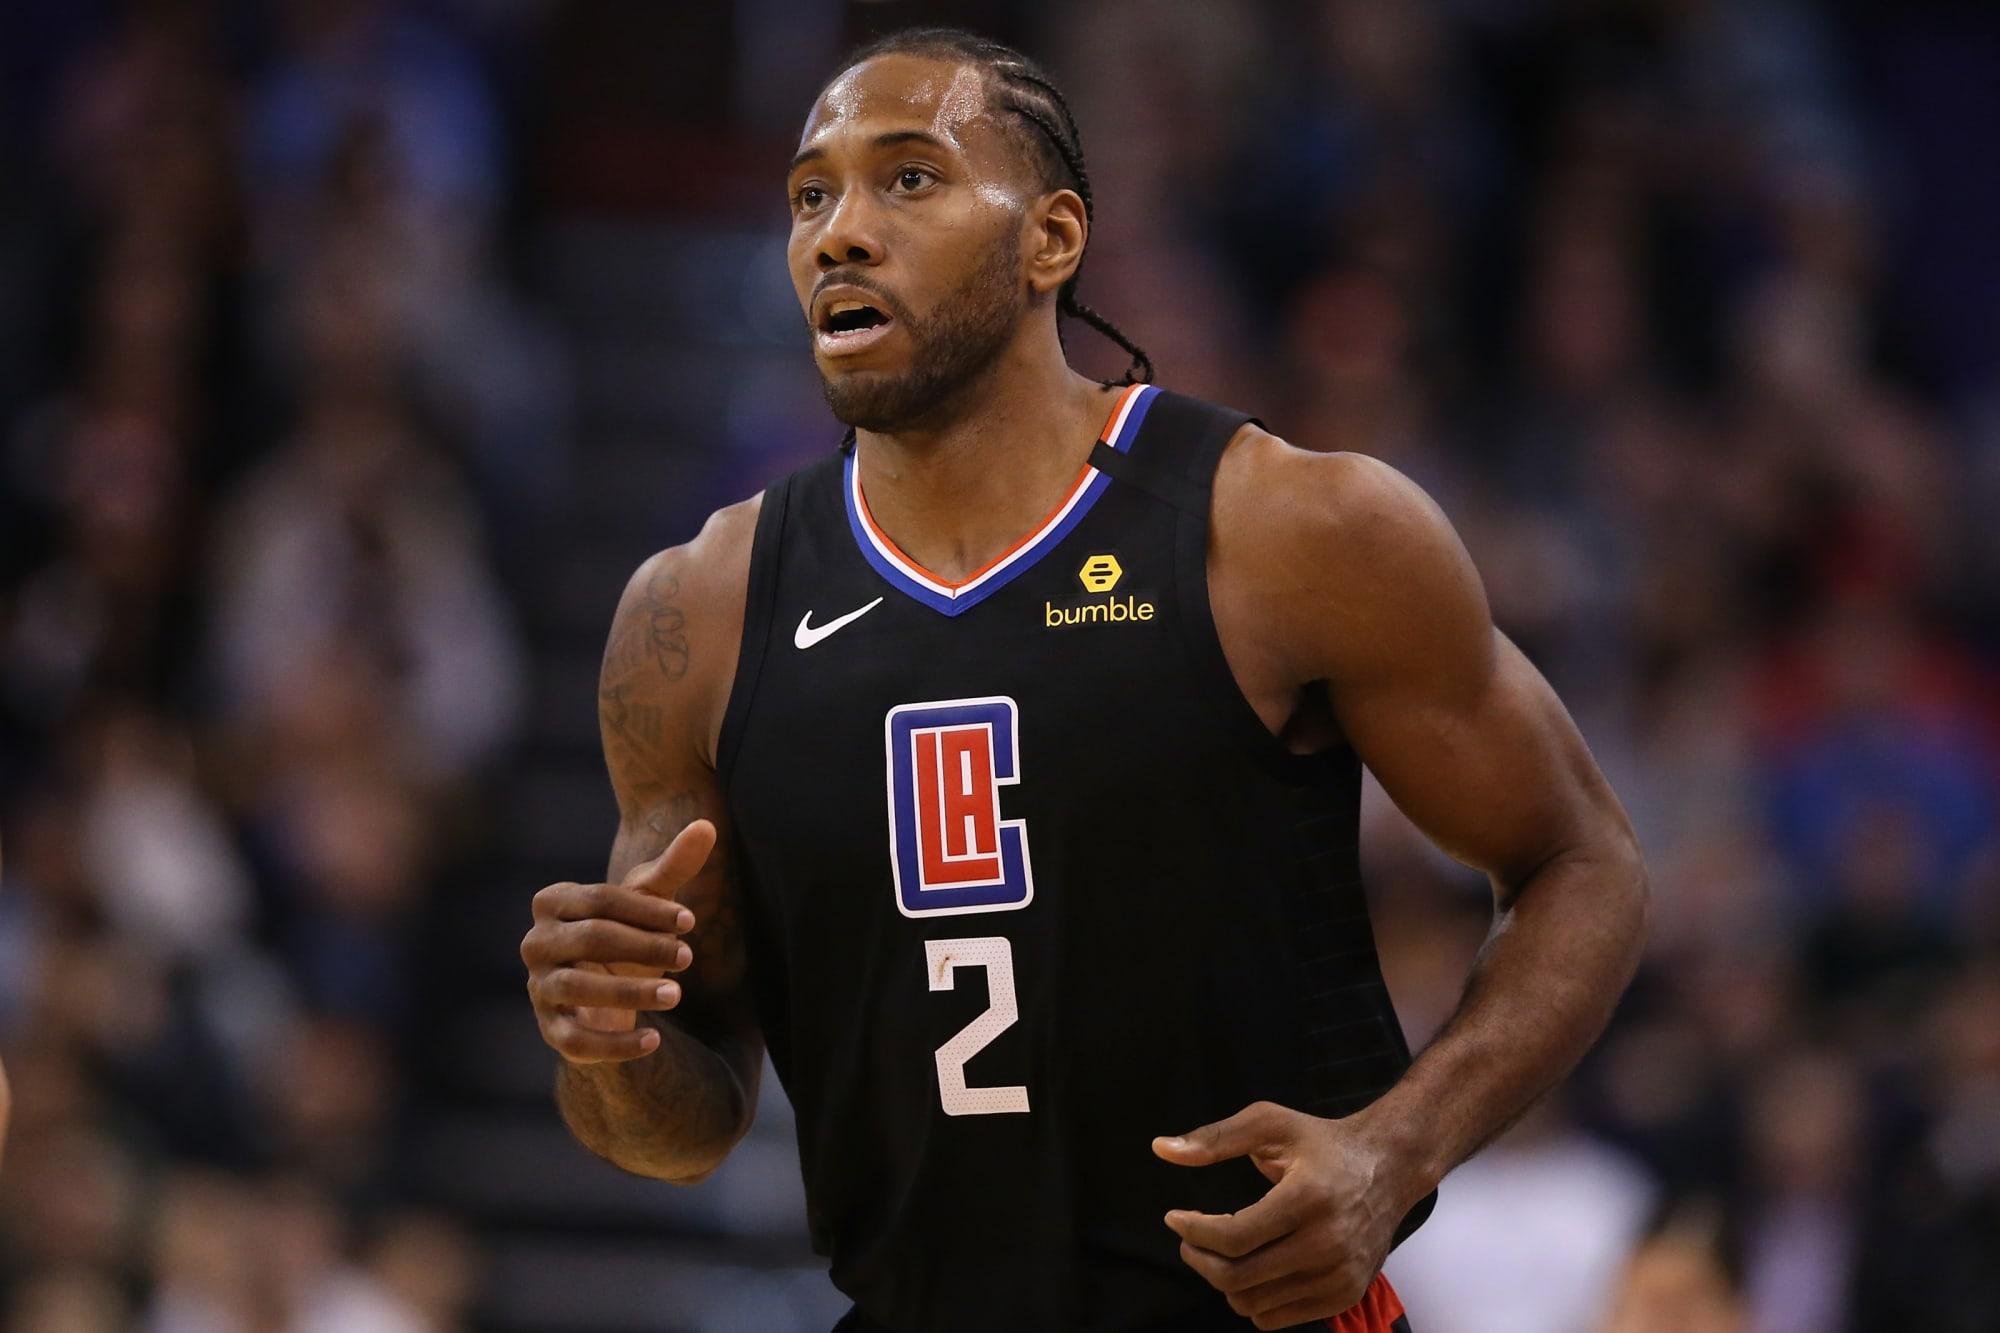 LA Clippers: Kawhi Leonard arrives, team gets Sunday off